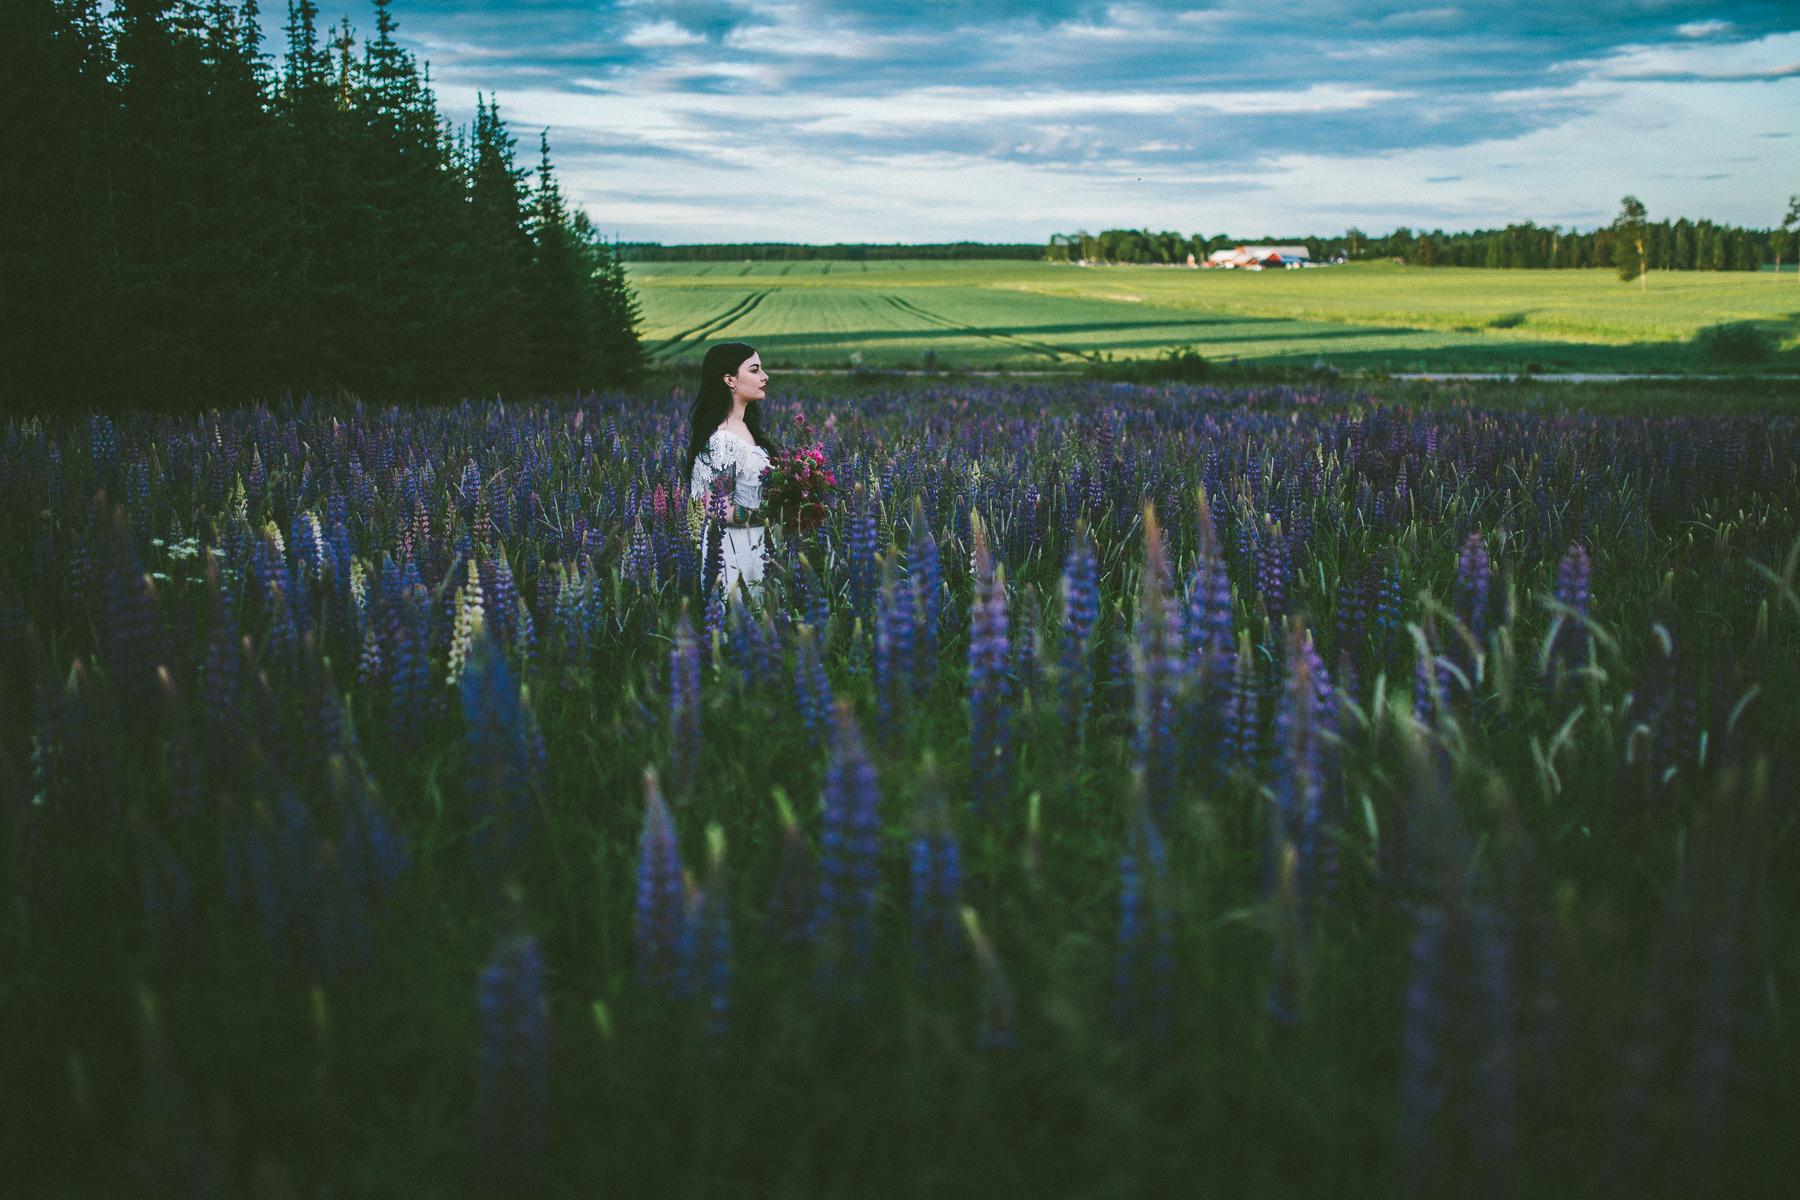 Sara-Bohemian-Moody-Alternative-Wedding-Photography-Inspiration-83